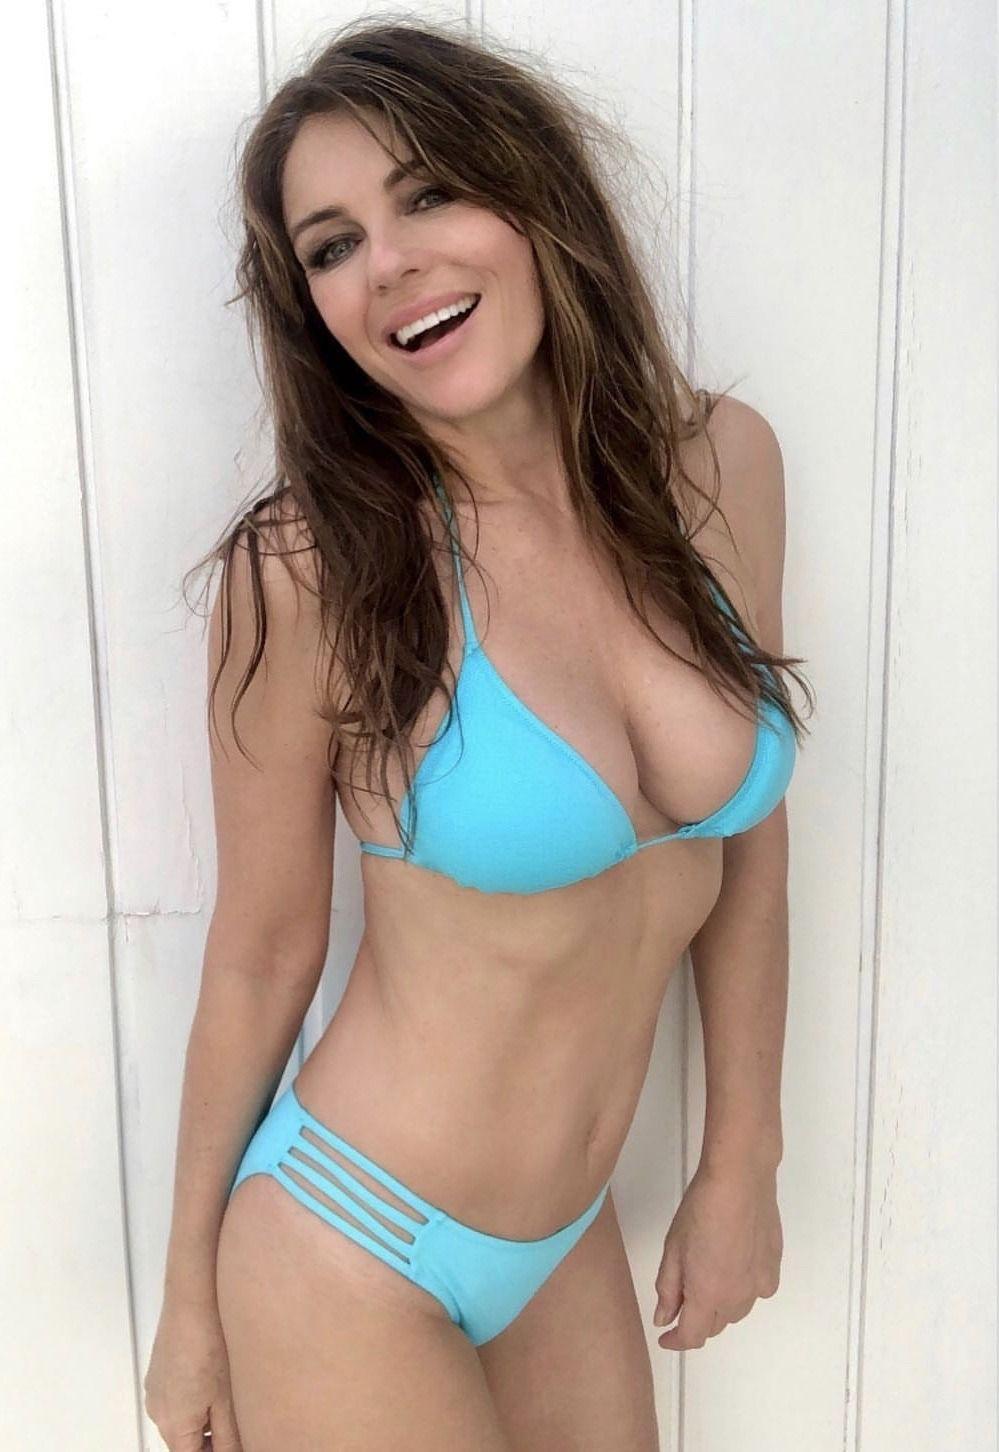 Bikini Goddess Elizabeth Hurley In 2020 Elizabeth Hurley Bikinis Celebrity Bikini Bodies